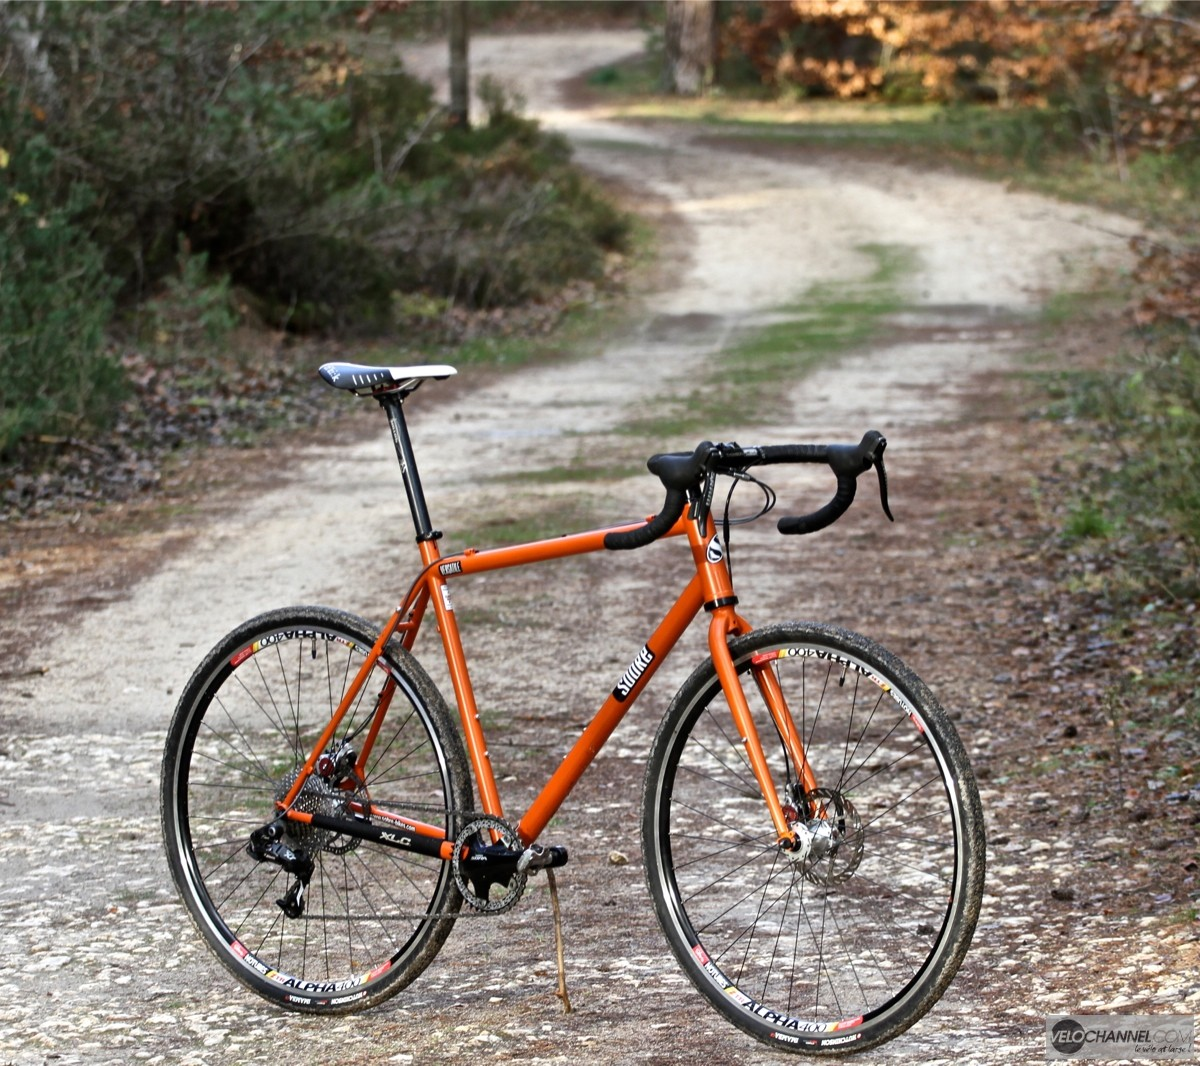 test-sobre-versatile-gravel-orange